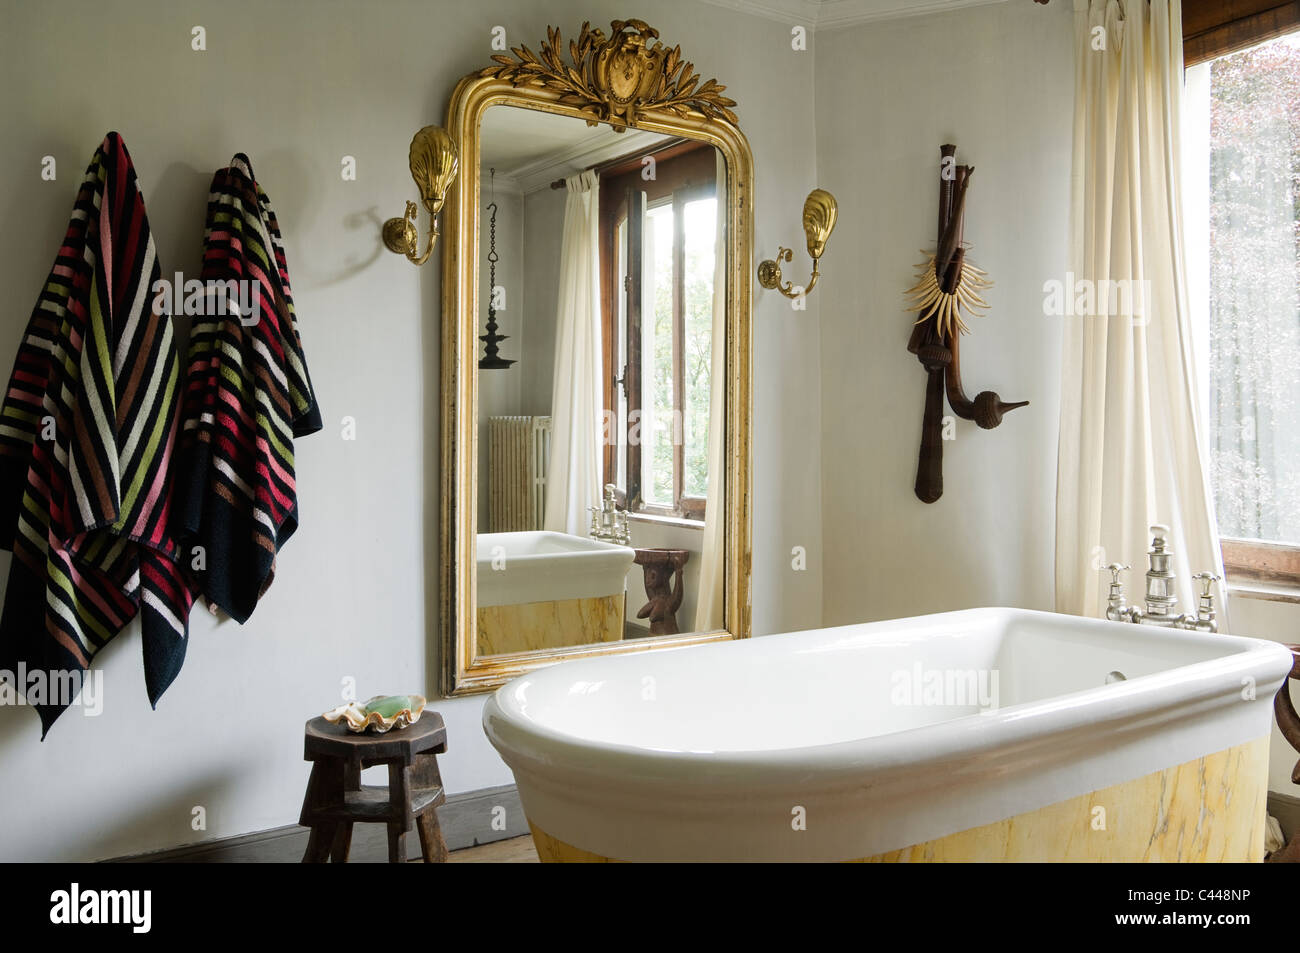 Vasca Da Bagno Francese : Vasca da bagno in francese appartamento appartamenti burgmann